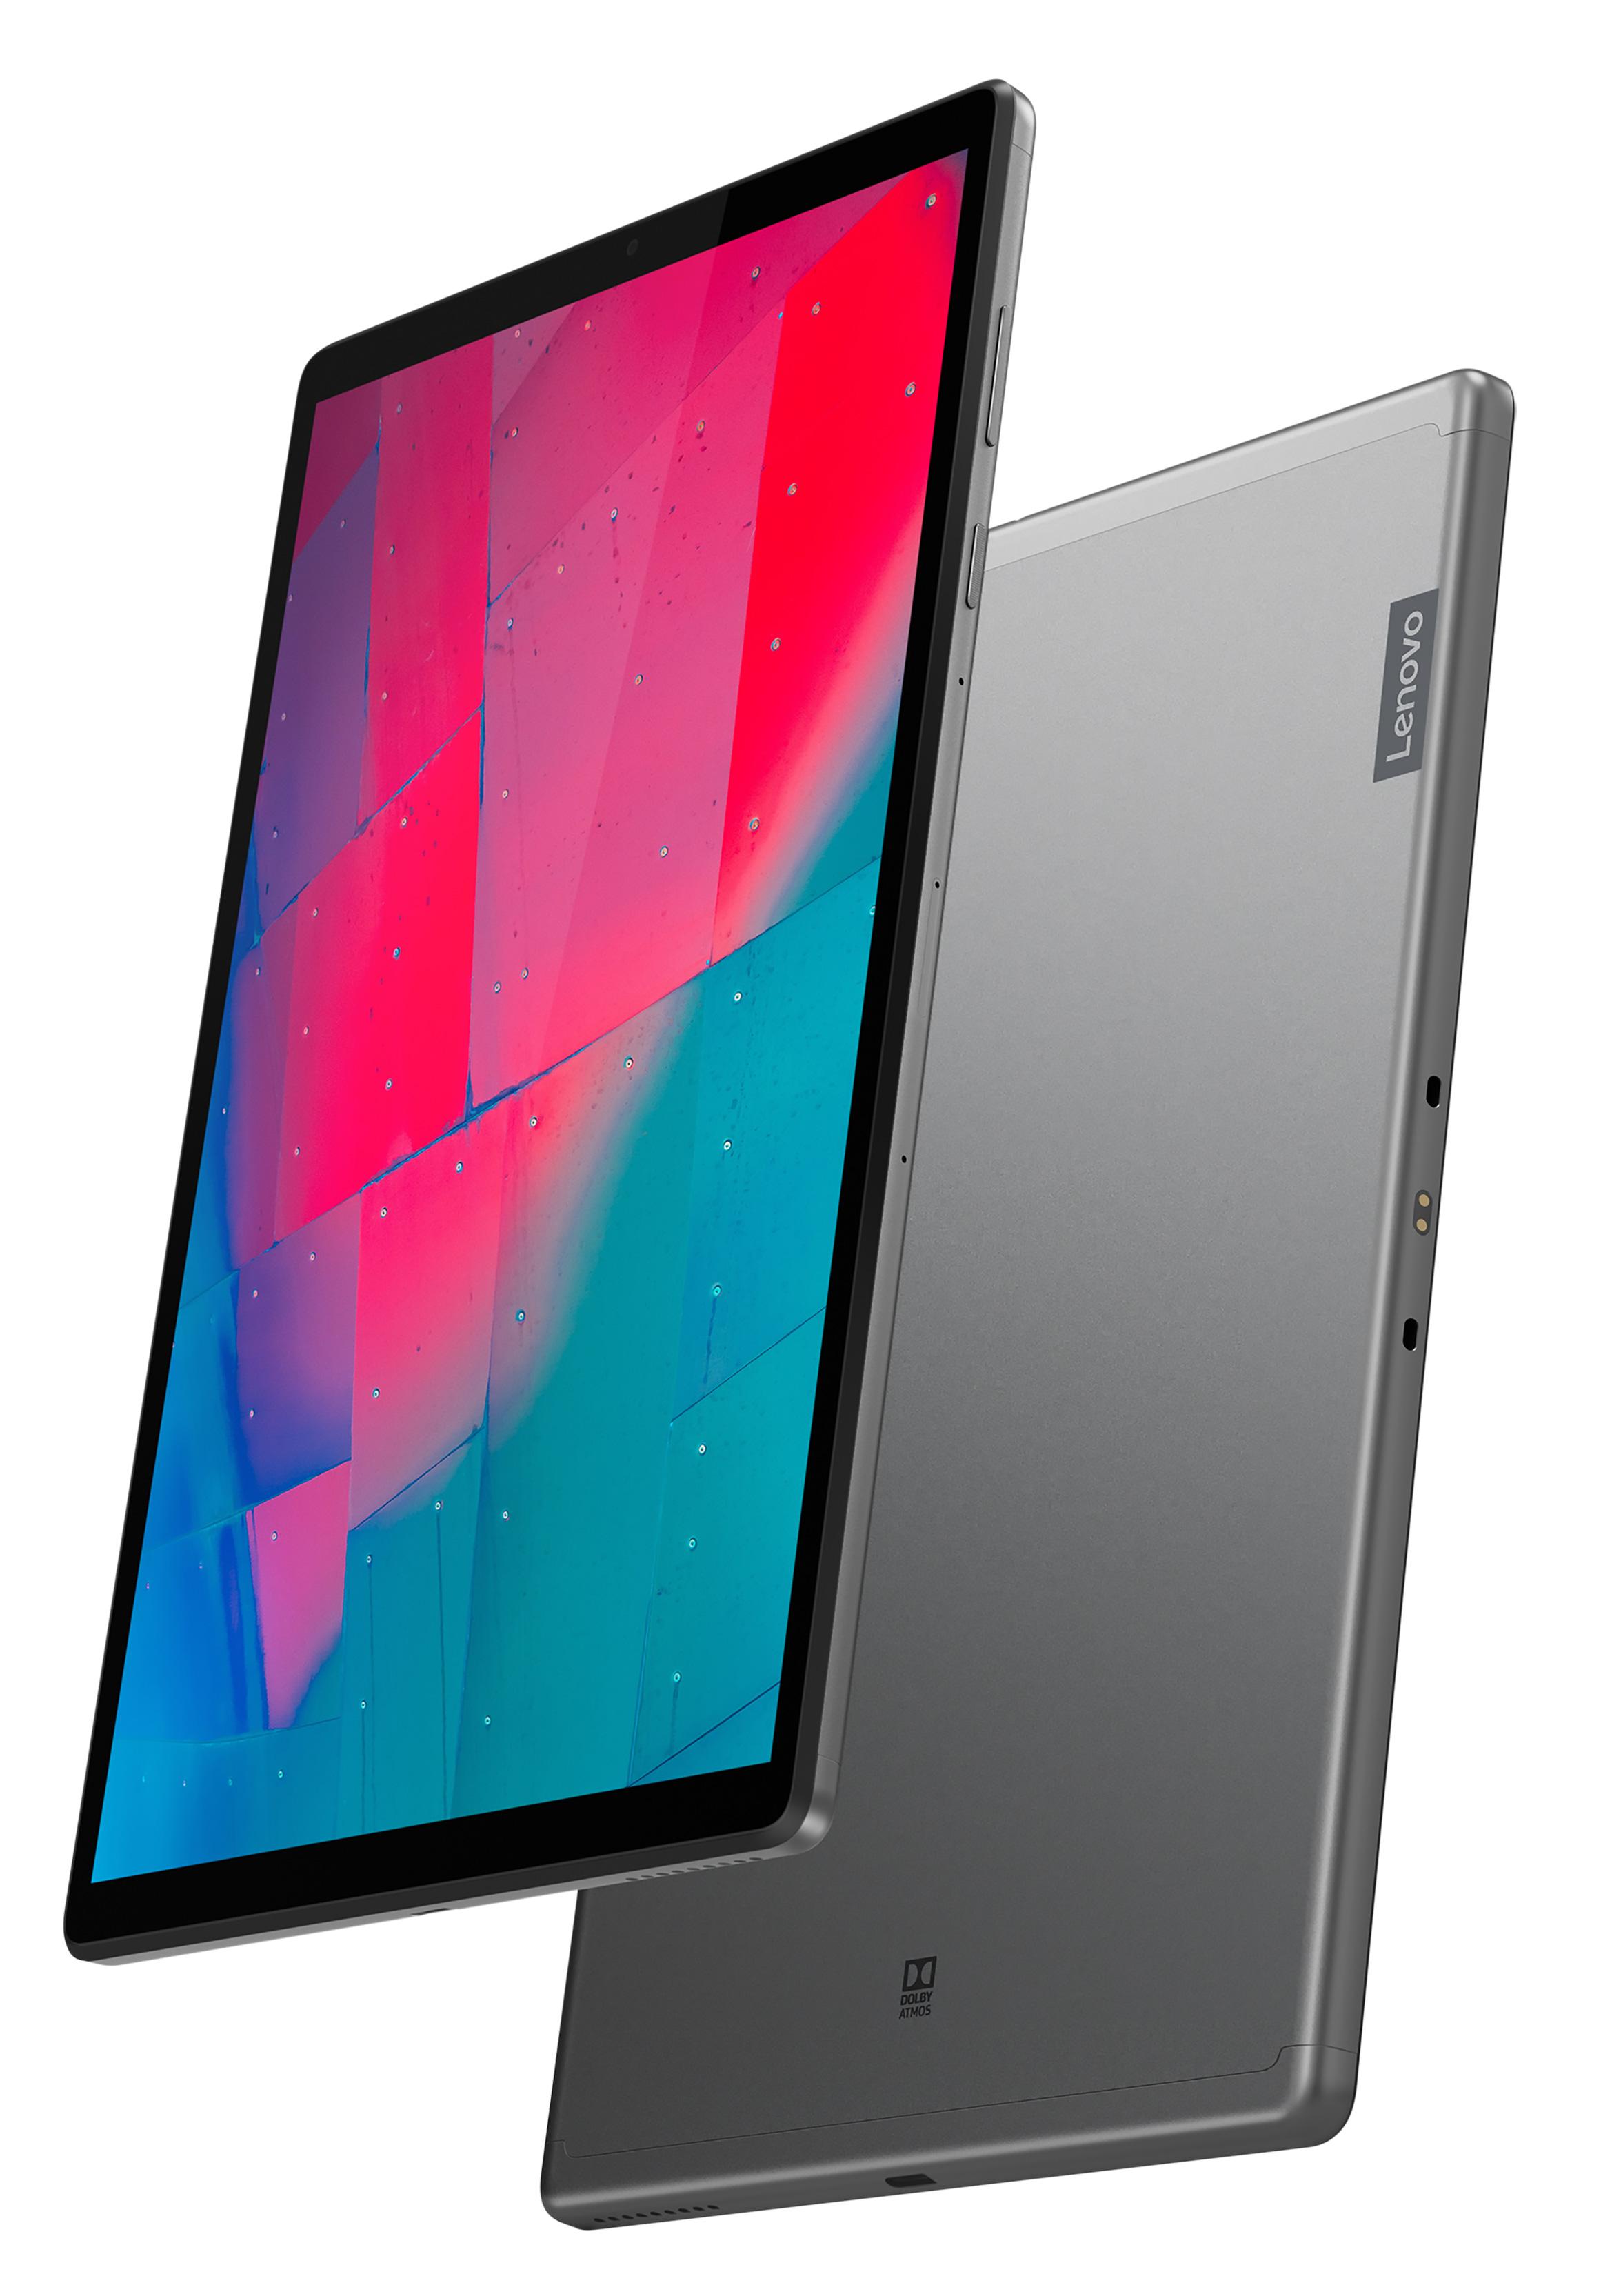 Фото  Планшет  Lenovo TAB M10 Plus FHD 4/64 LTE Iron Grey (ZA5V0289RU)